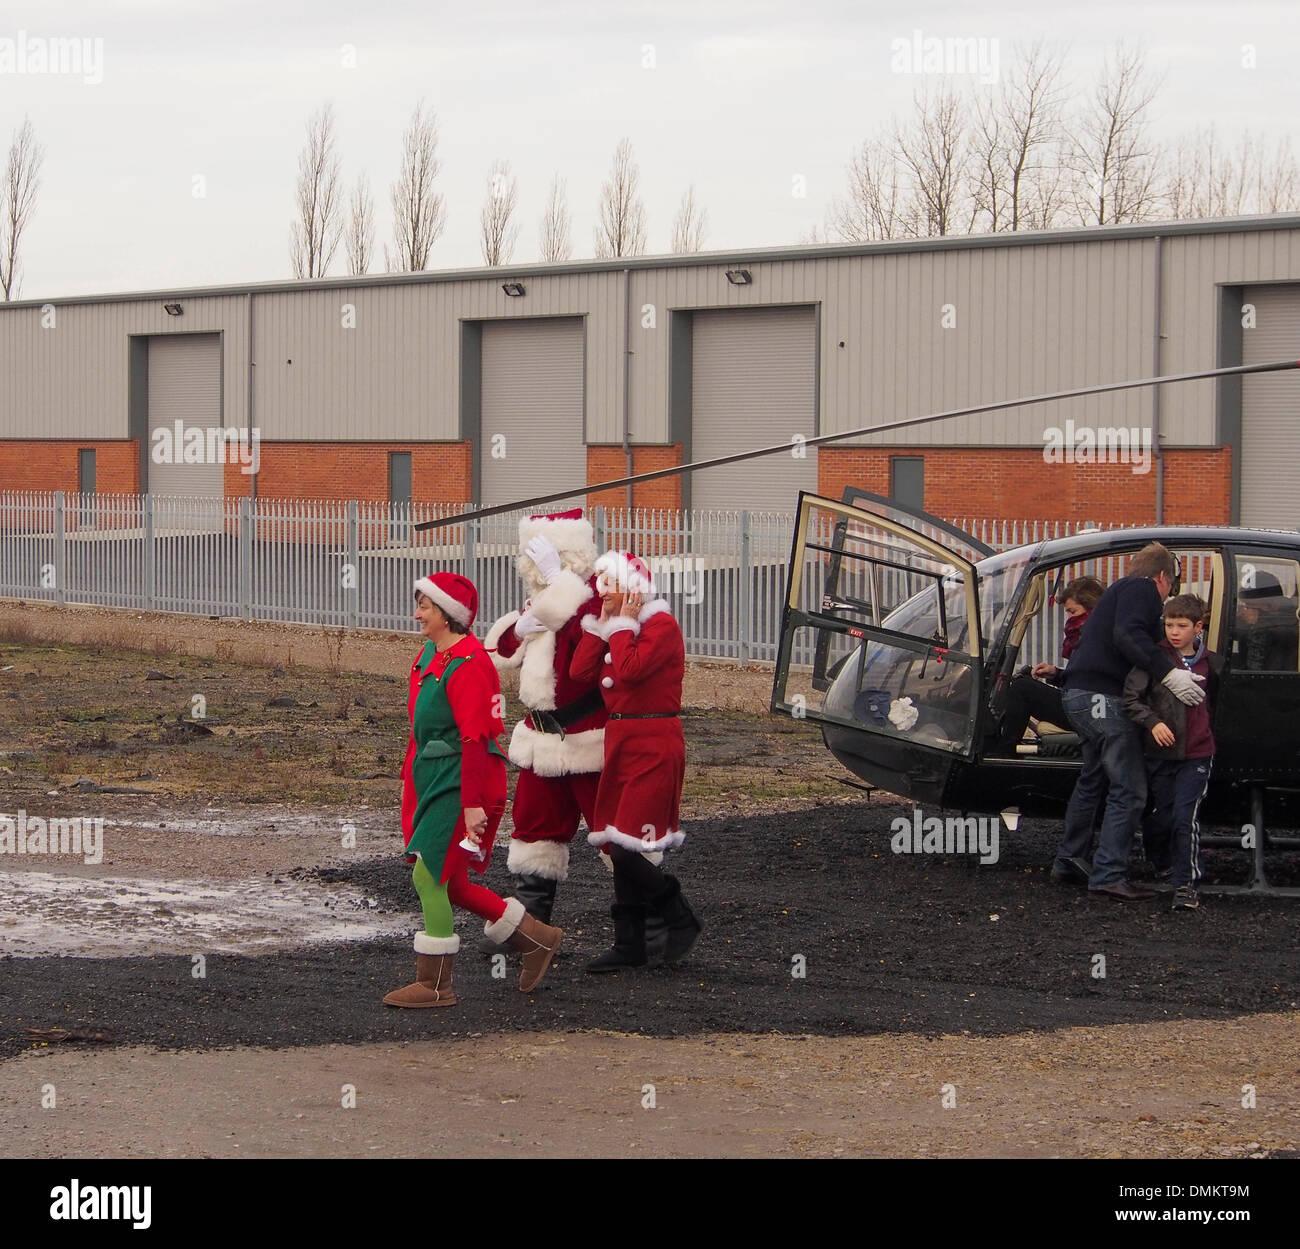 Leyland, Preston, Lancashire, UK. 15th Dec 2013. Santas elves escorting Santa to meet the children and parents awaiting his arrival. Credit:  Sue Burton/Alamy Live News - Stock Image